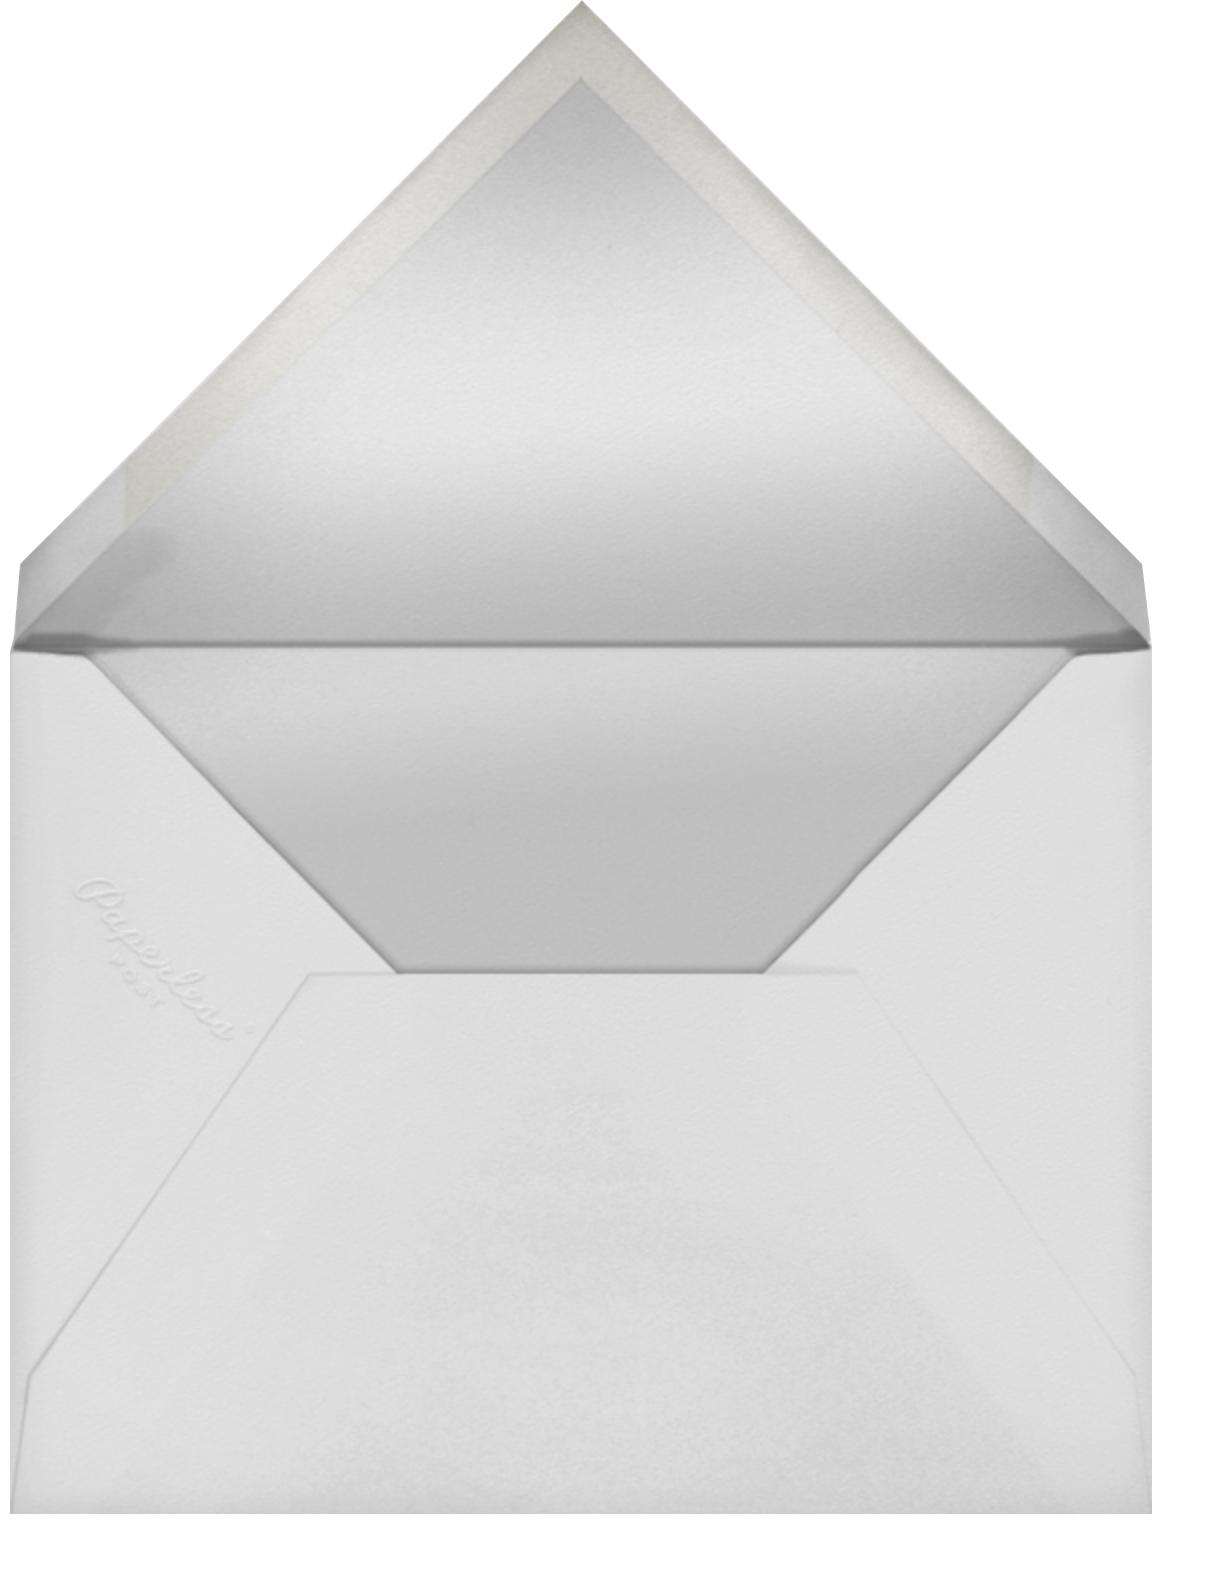 Manhattan Skyline View (Menu) - White/Black - Paperless Post - Menus - envelope back